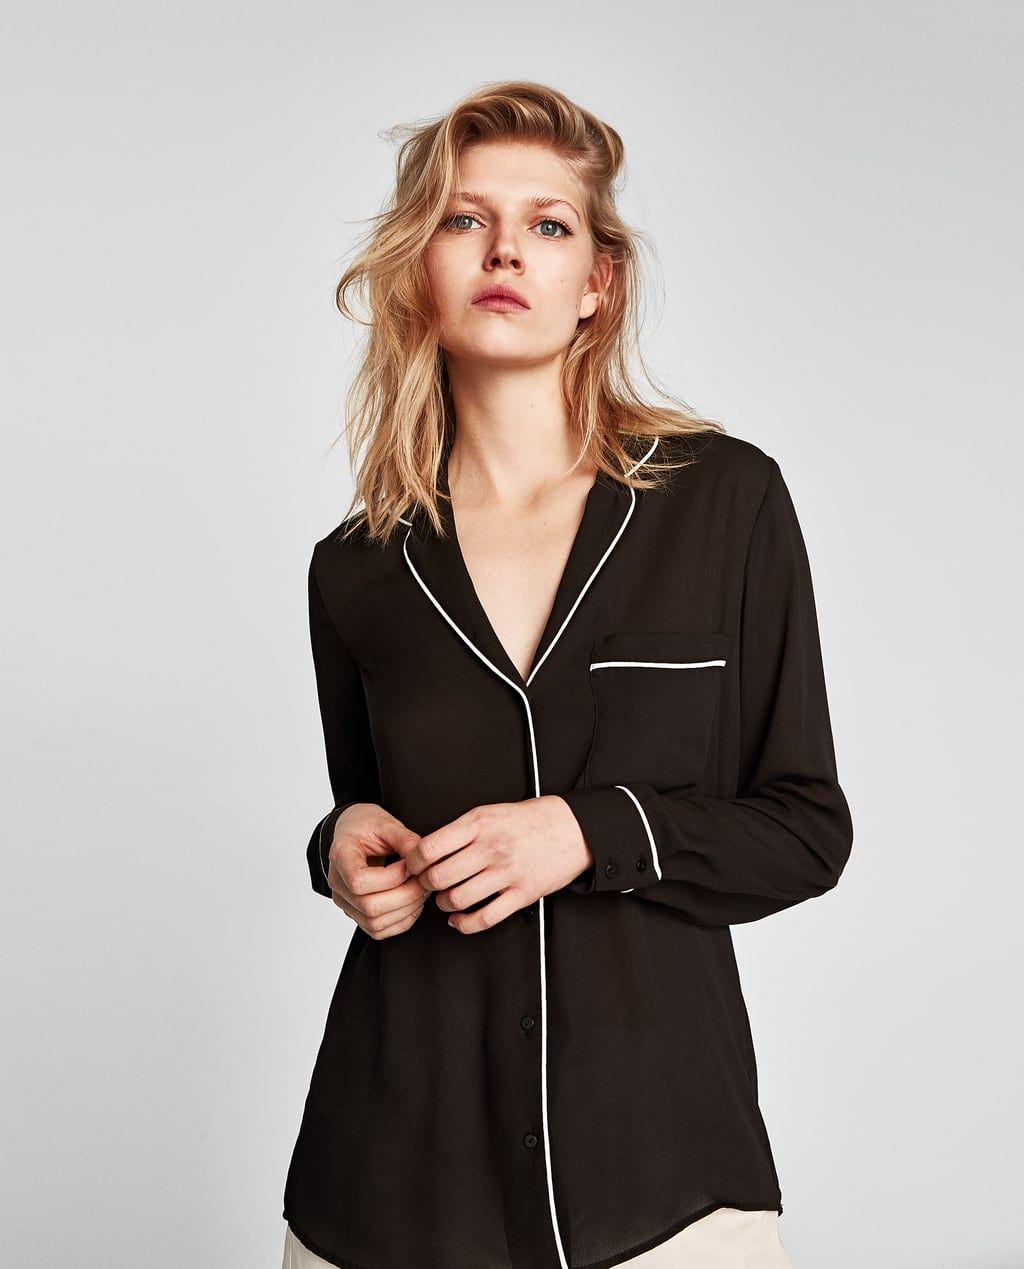 Zara Dan 2 Biyeli Pijama Tipi Gomlek Resmi Pajama Shirt Womens Shirts Pajamas